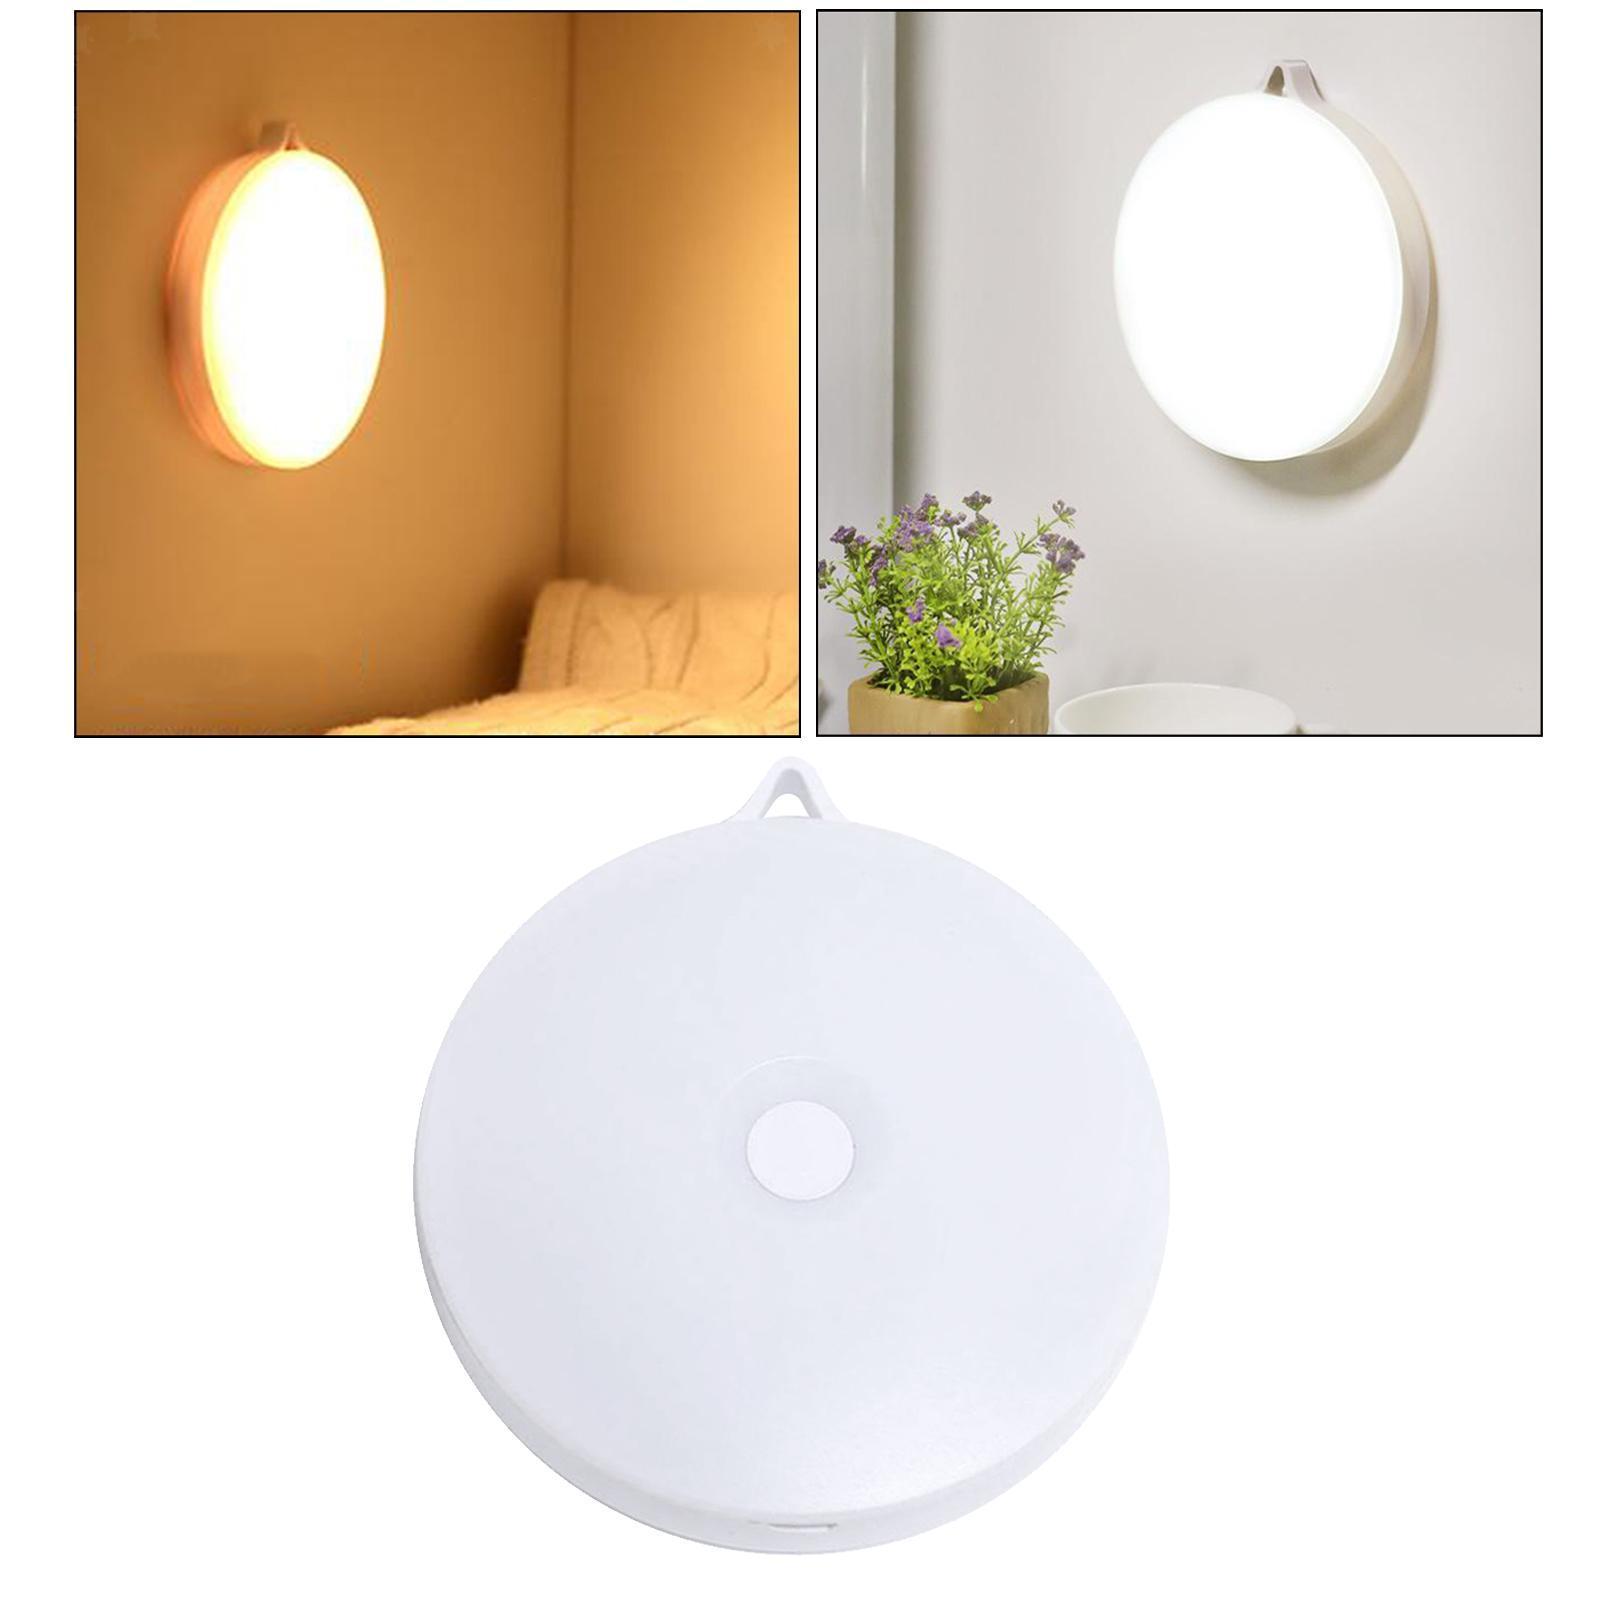 miniatura 10 - Luce notturna a LED per camera da letto ricaricabile USB per Hotel con sensore